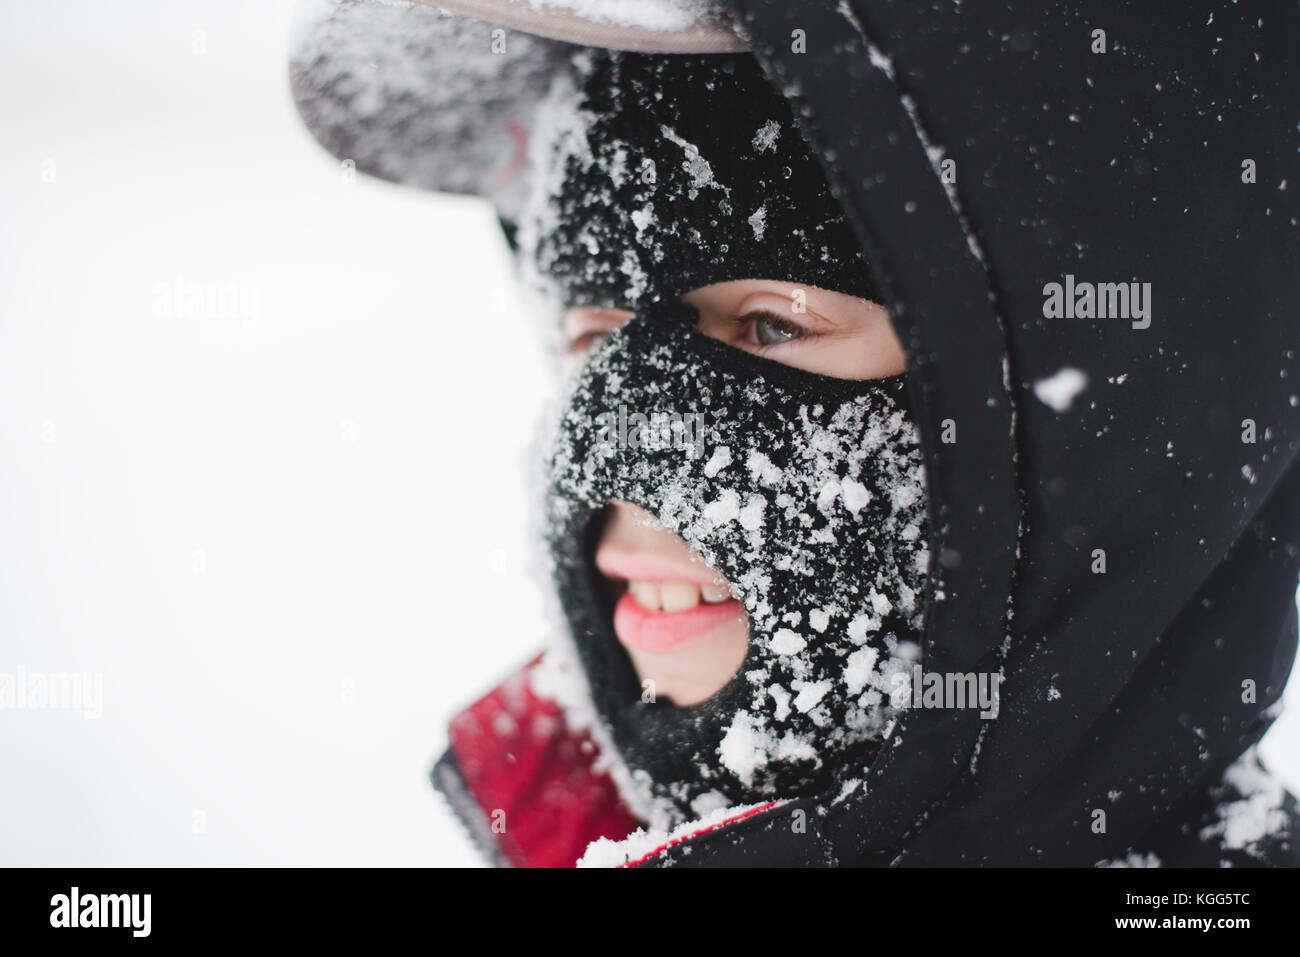 Bambino che indossa una maschera da sci coperta di neve Immagini Stock